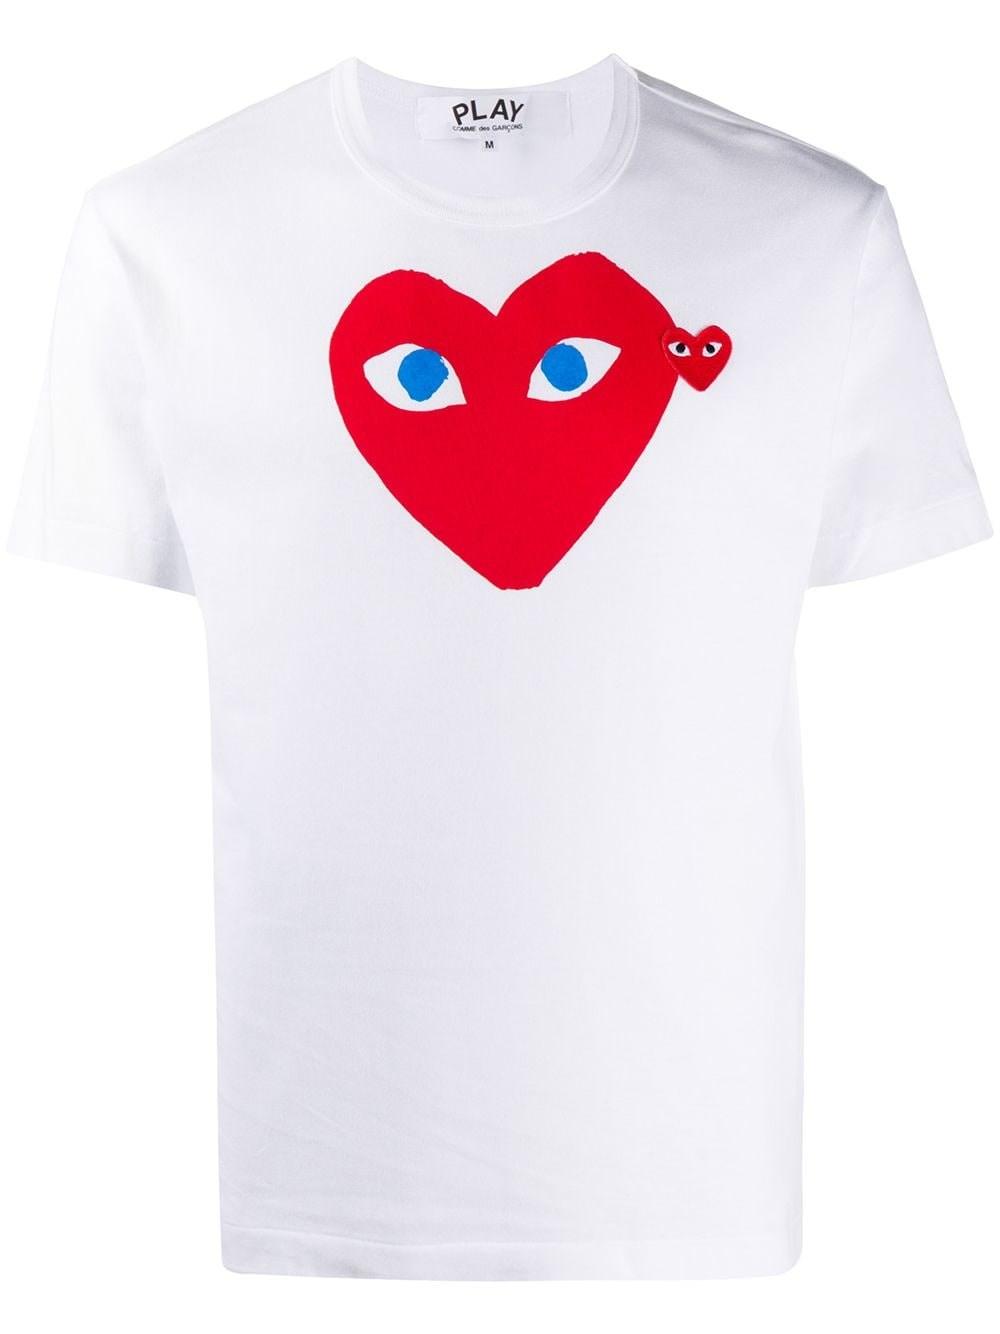 COMME DES GARCONS PLAY White Slim Fit T-Shirt